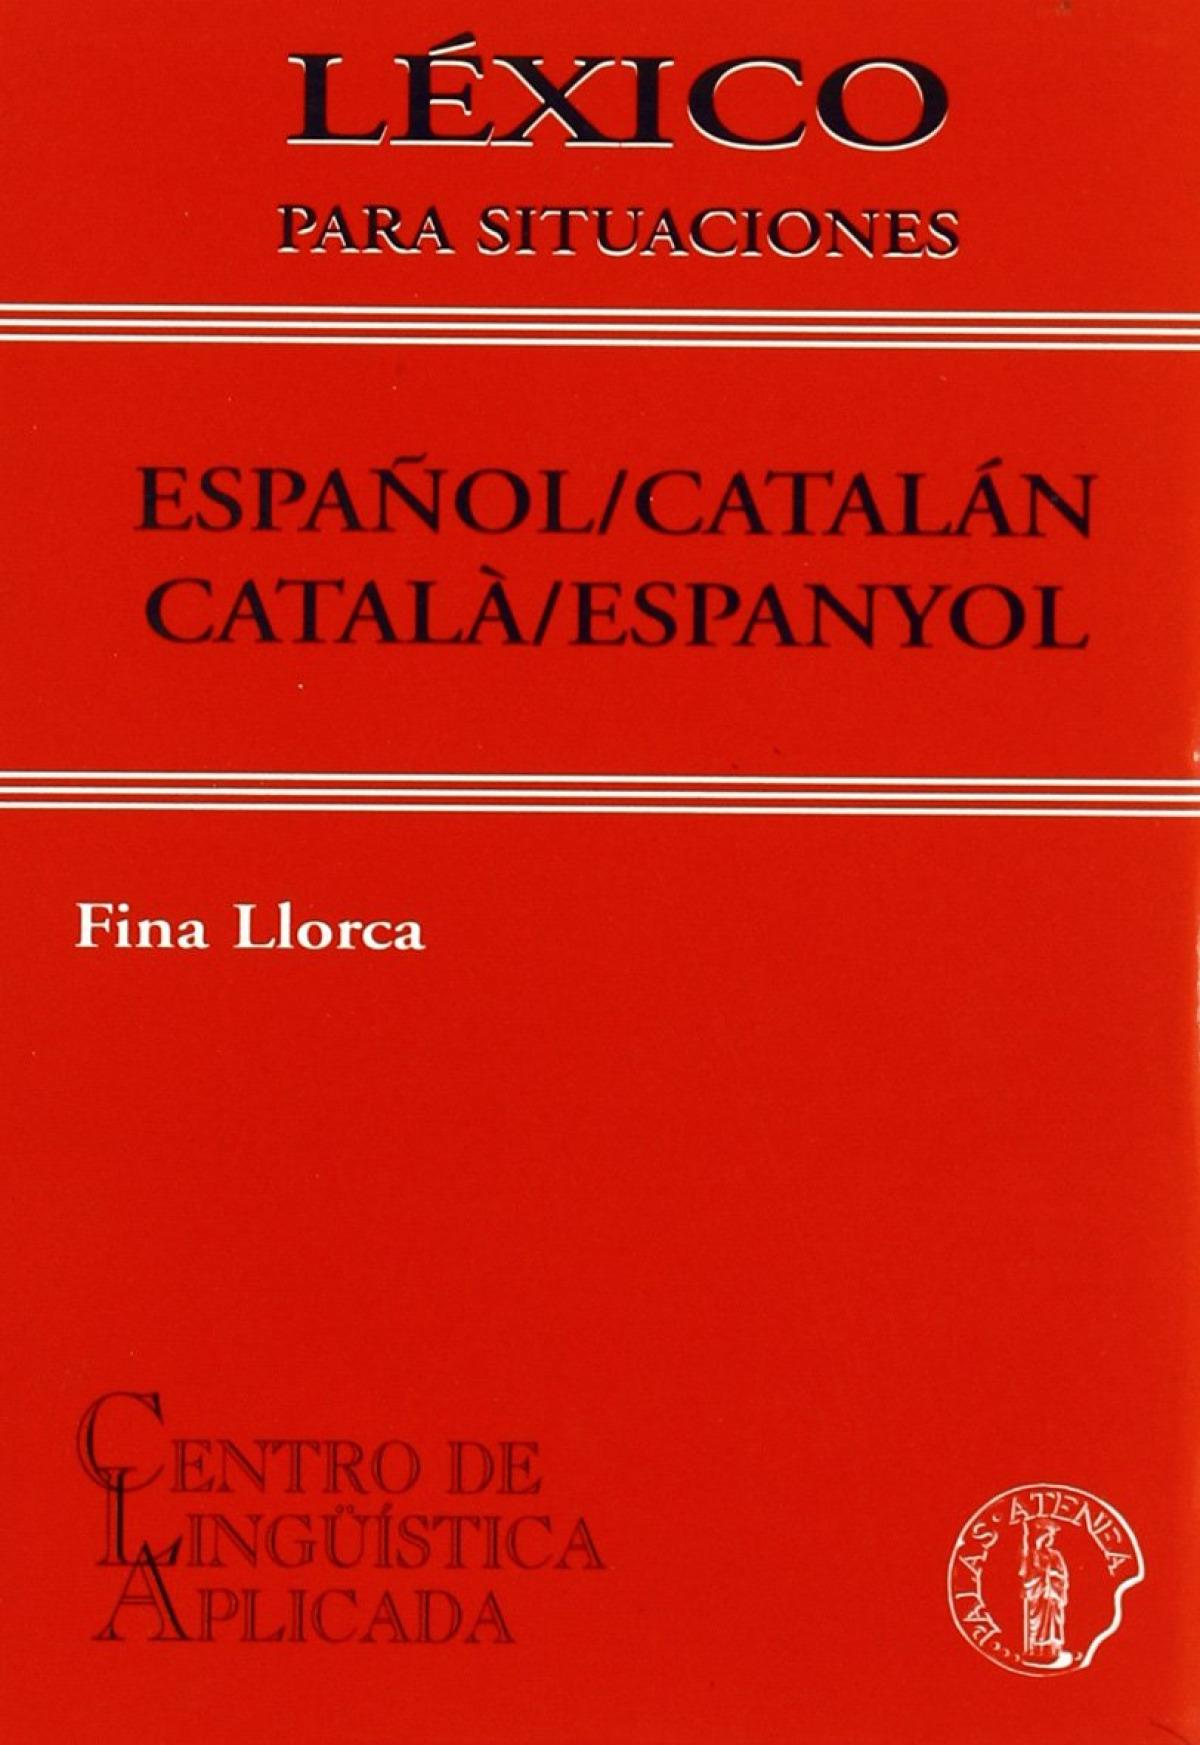 Lexico para situaciones español/catalan vv 9788495855206